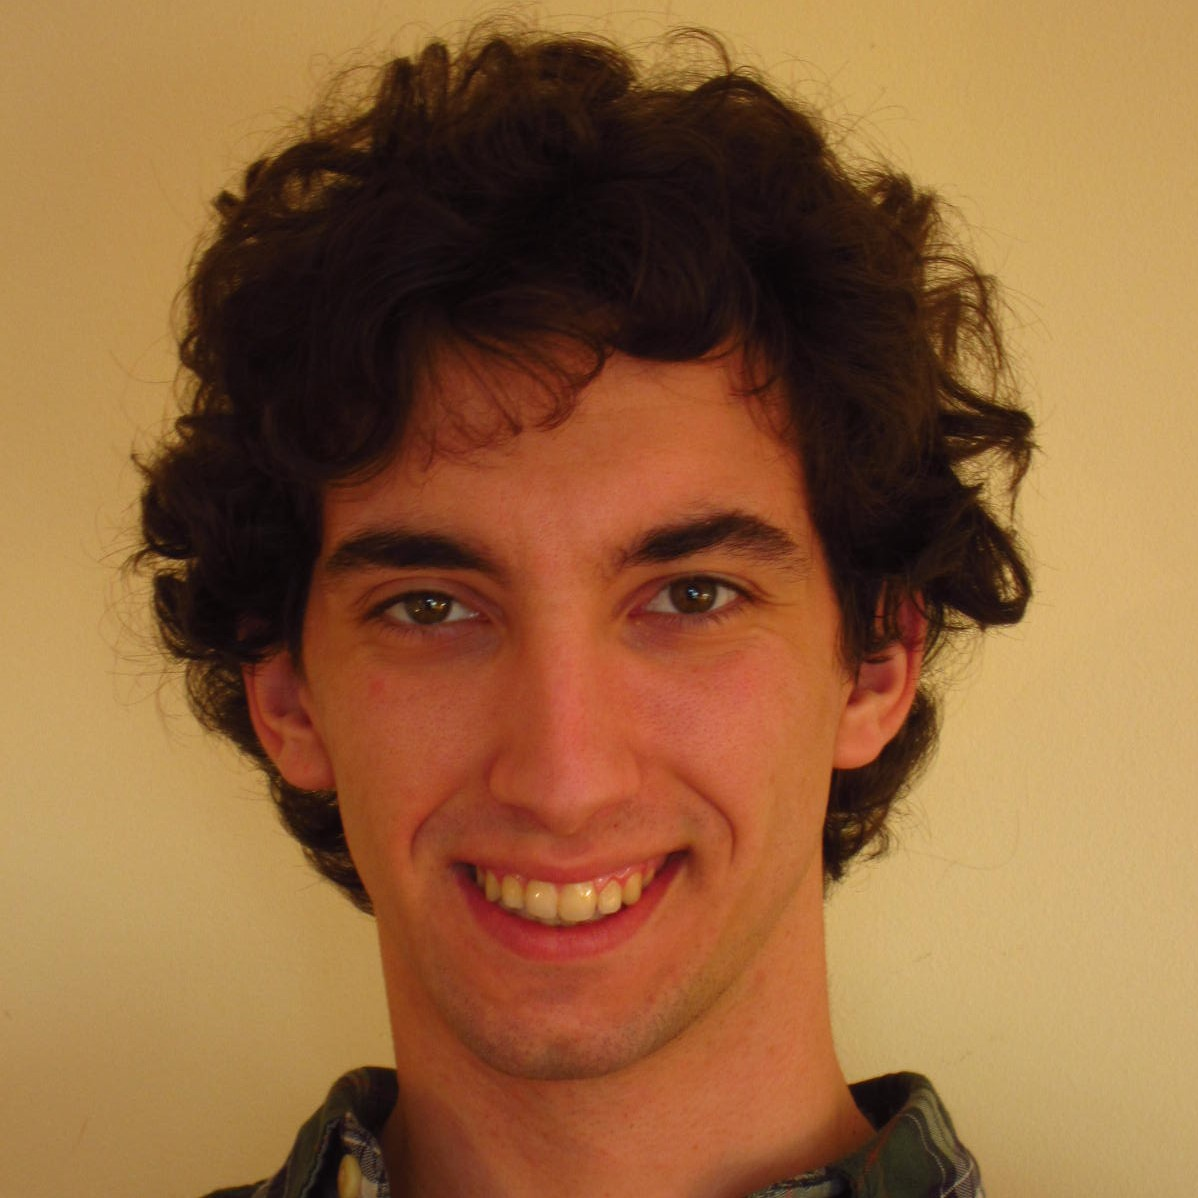 Portrait photo of Marcel Llavero Pasquina